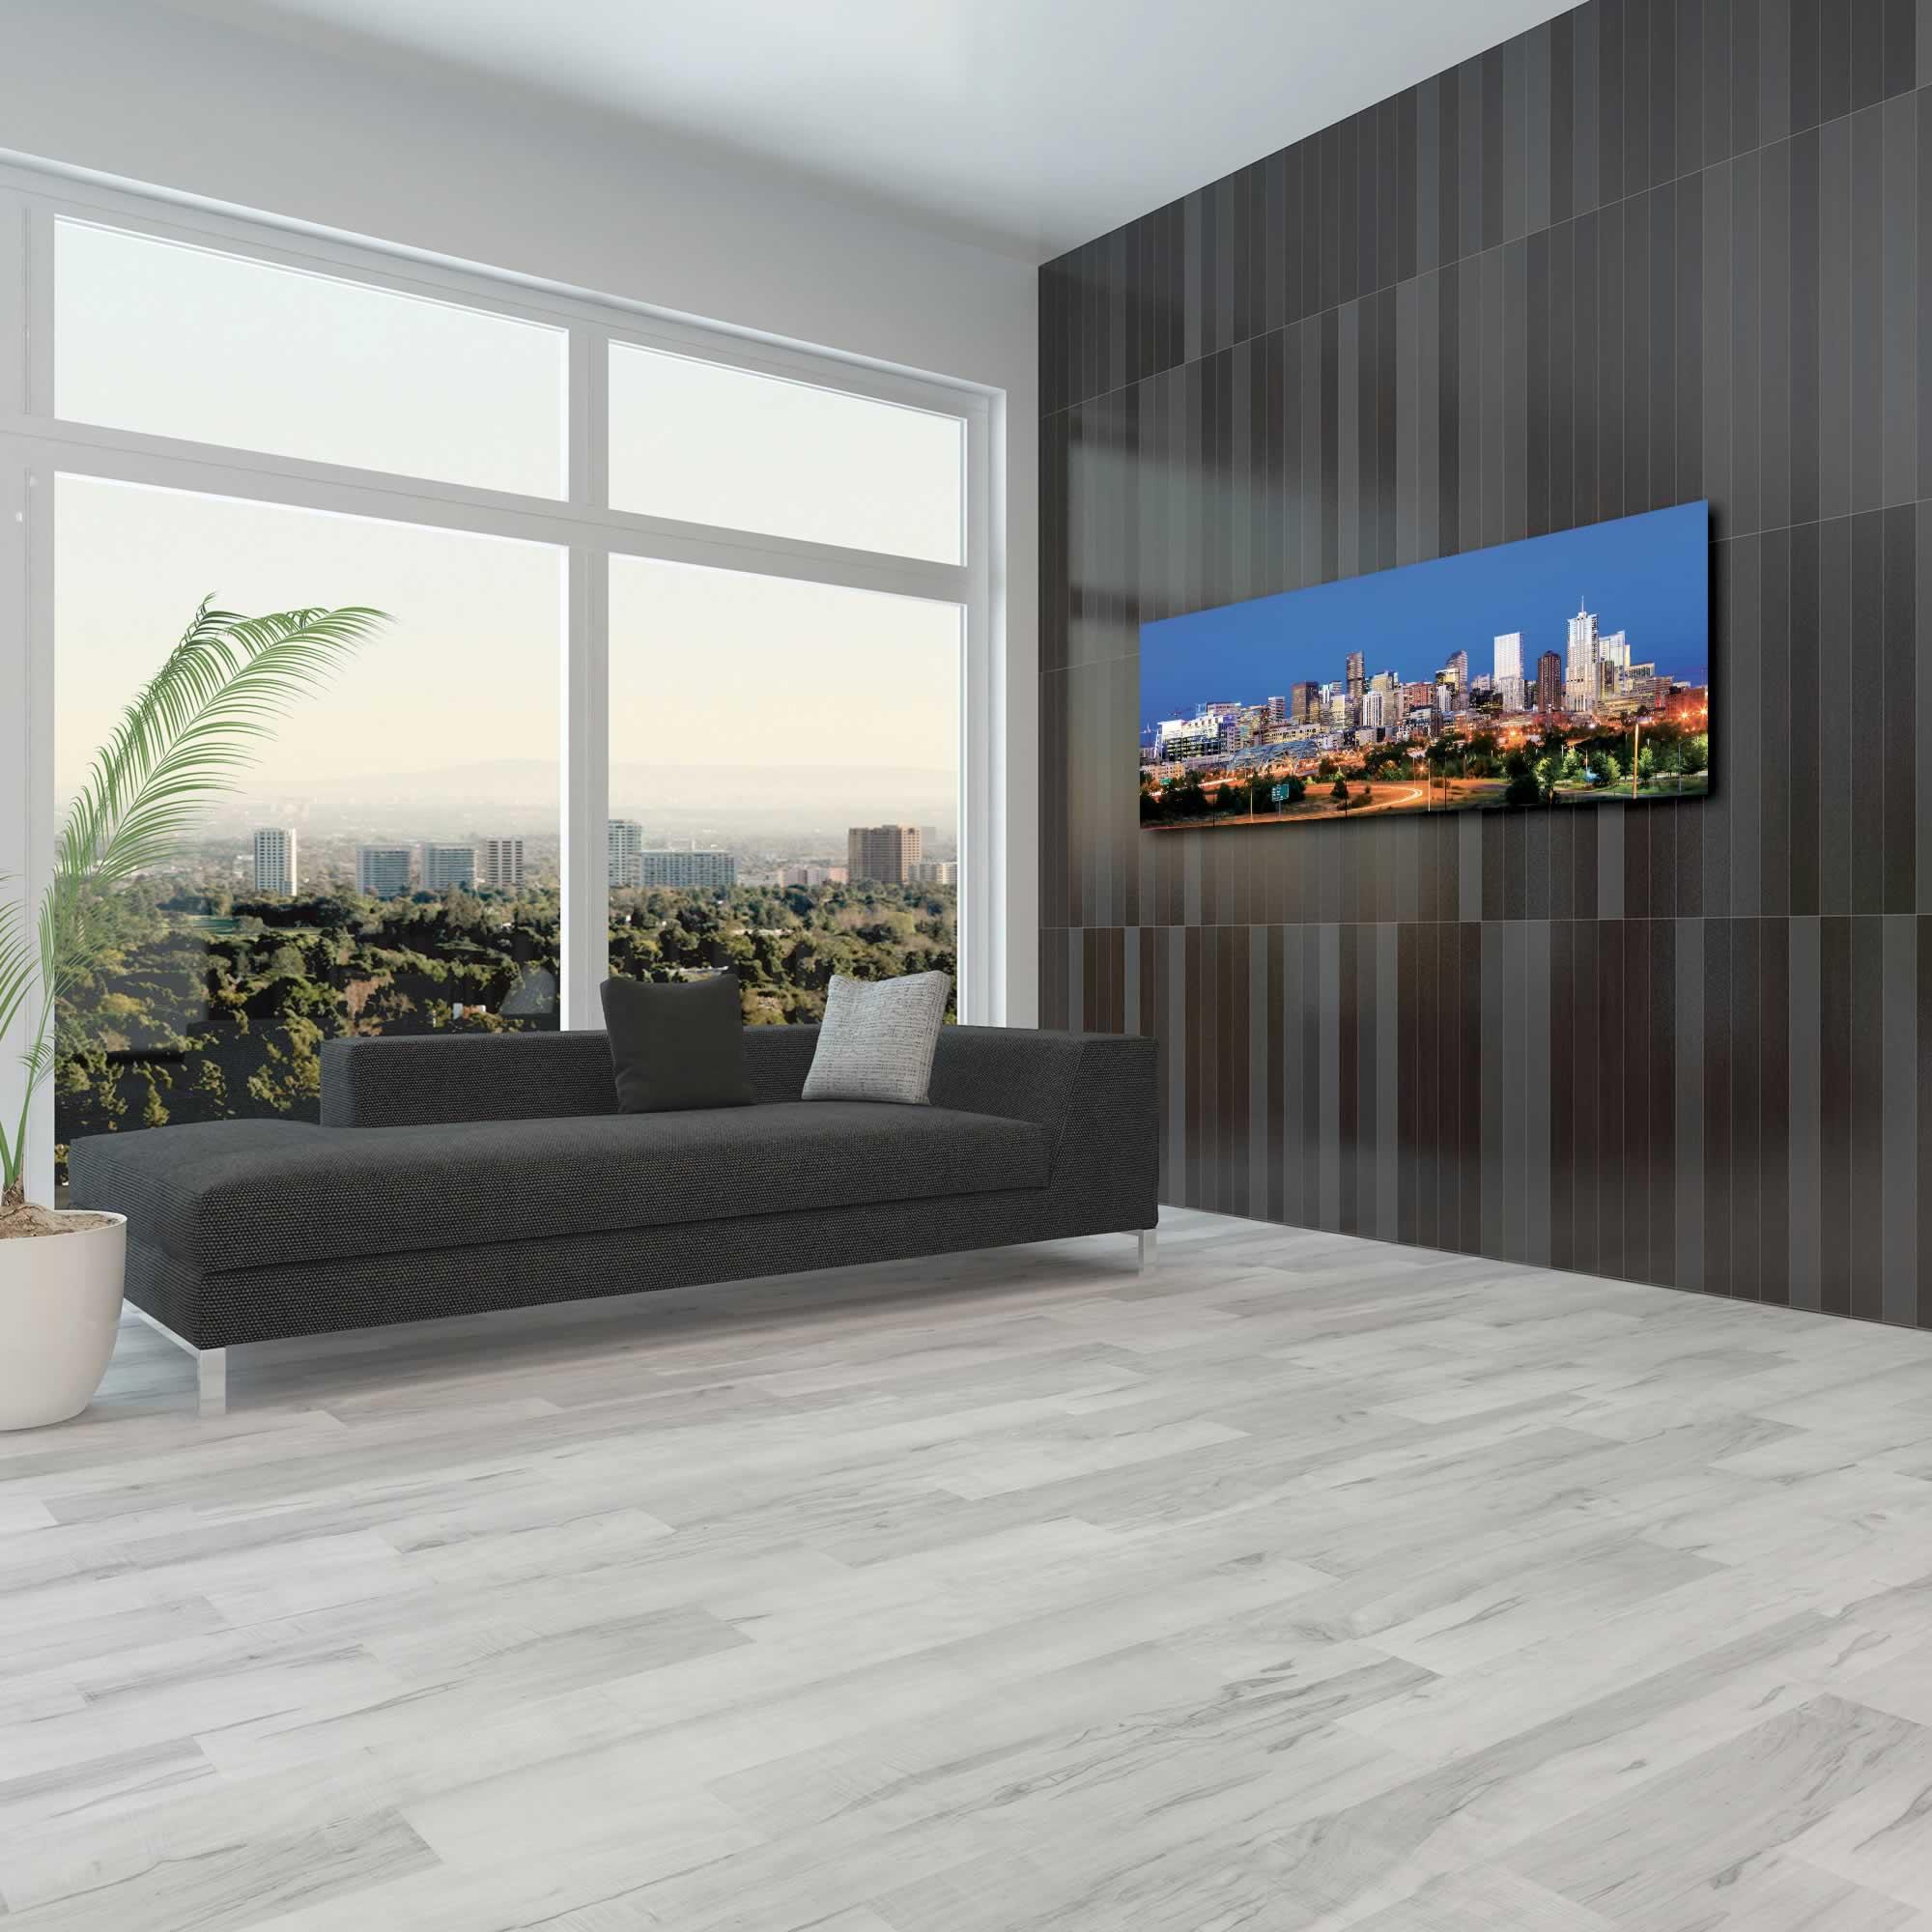 Denver City Skyline - Urban Modern Art, Designer Home Decor, Cityscape Wall Artwork, Trendy Contemporary Art - Alternate View 3